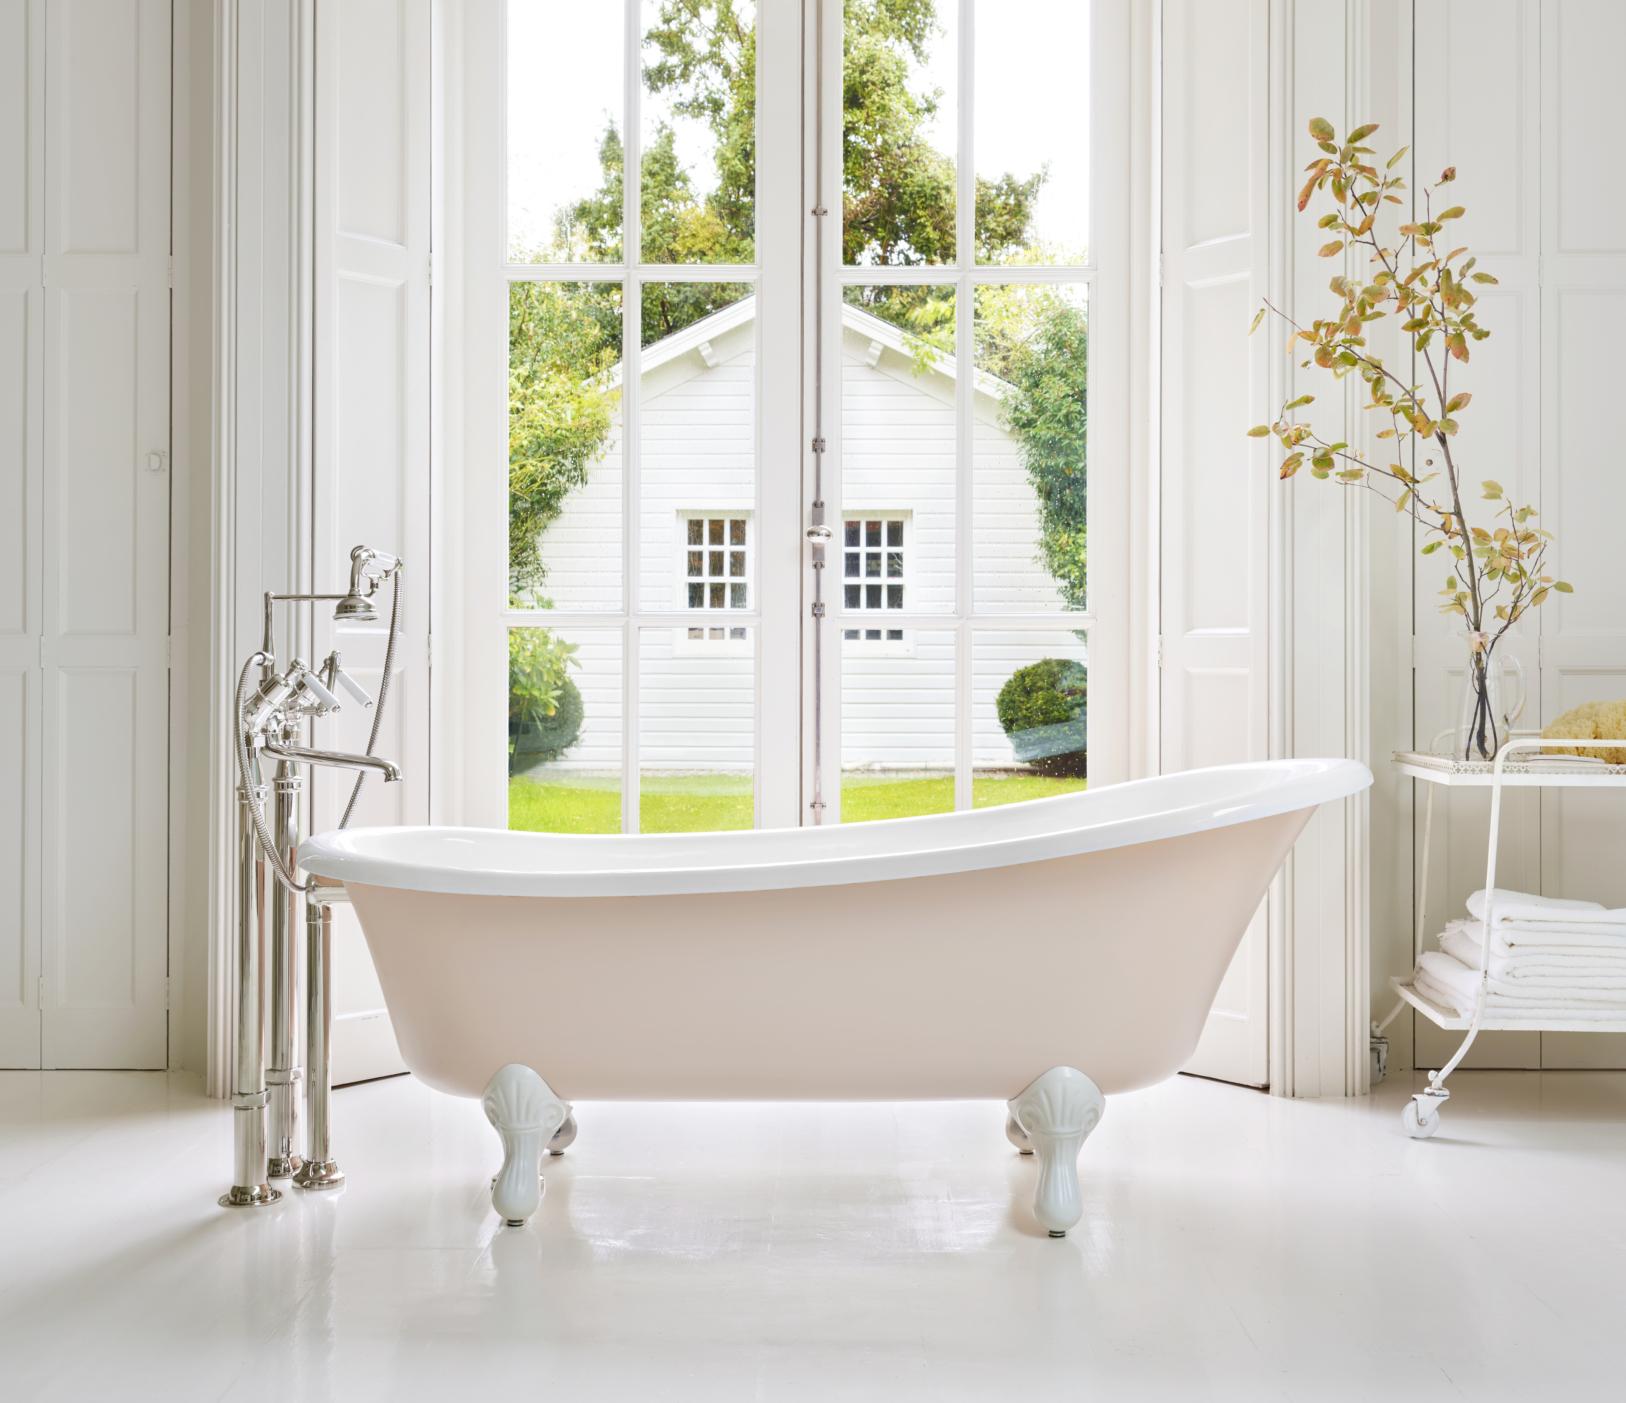 The Whitewater Bath Tub